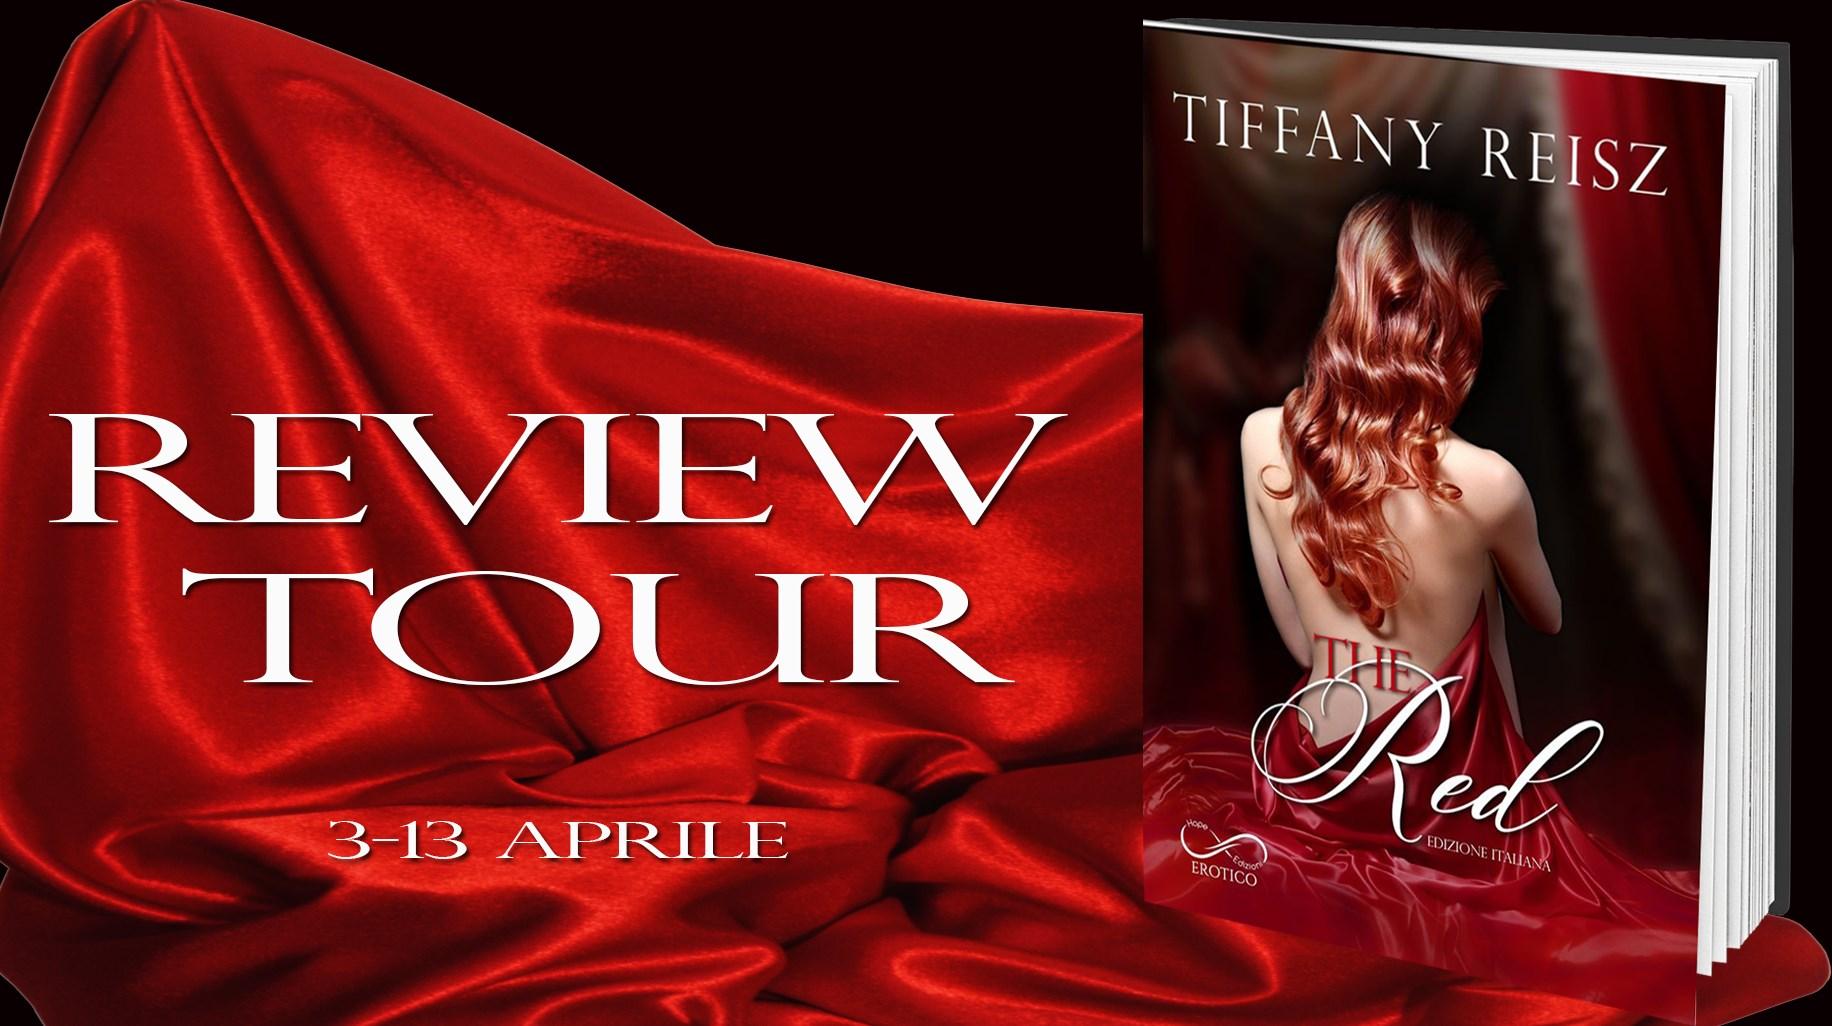 The Red di Tiffany Reisz